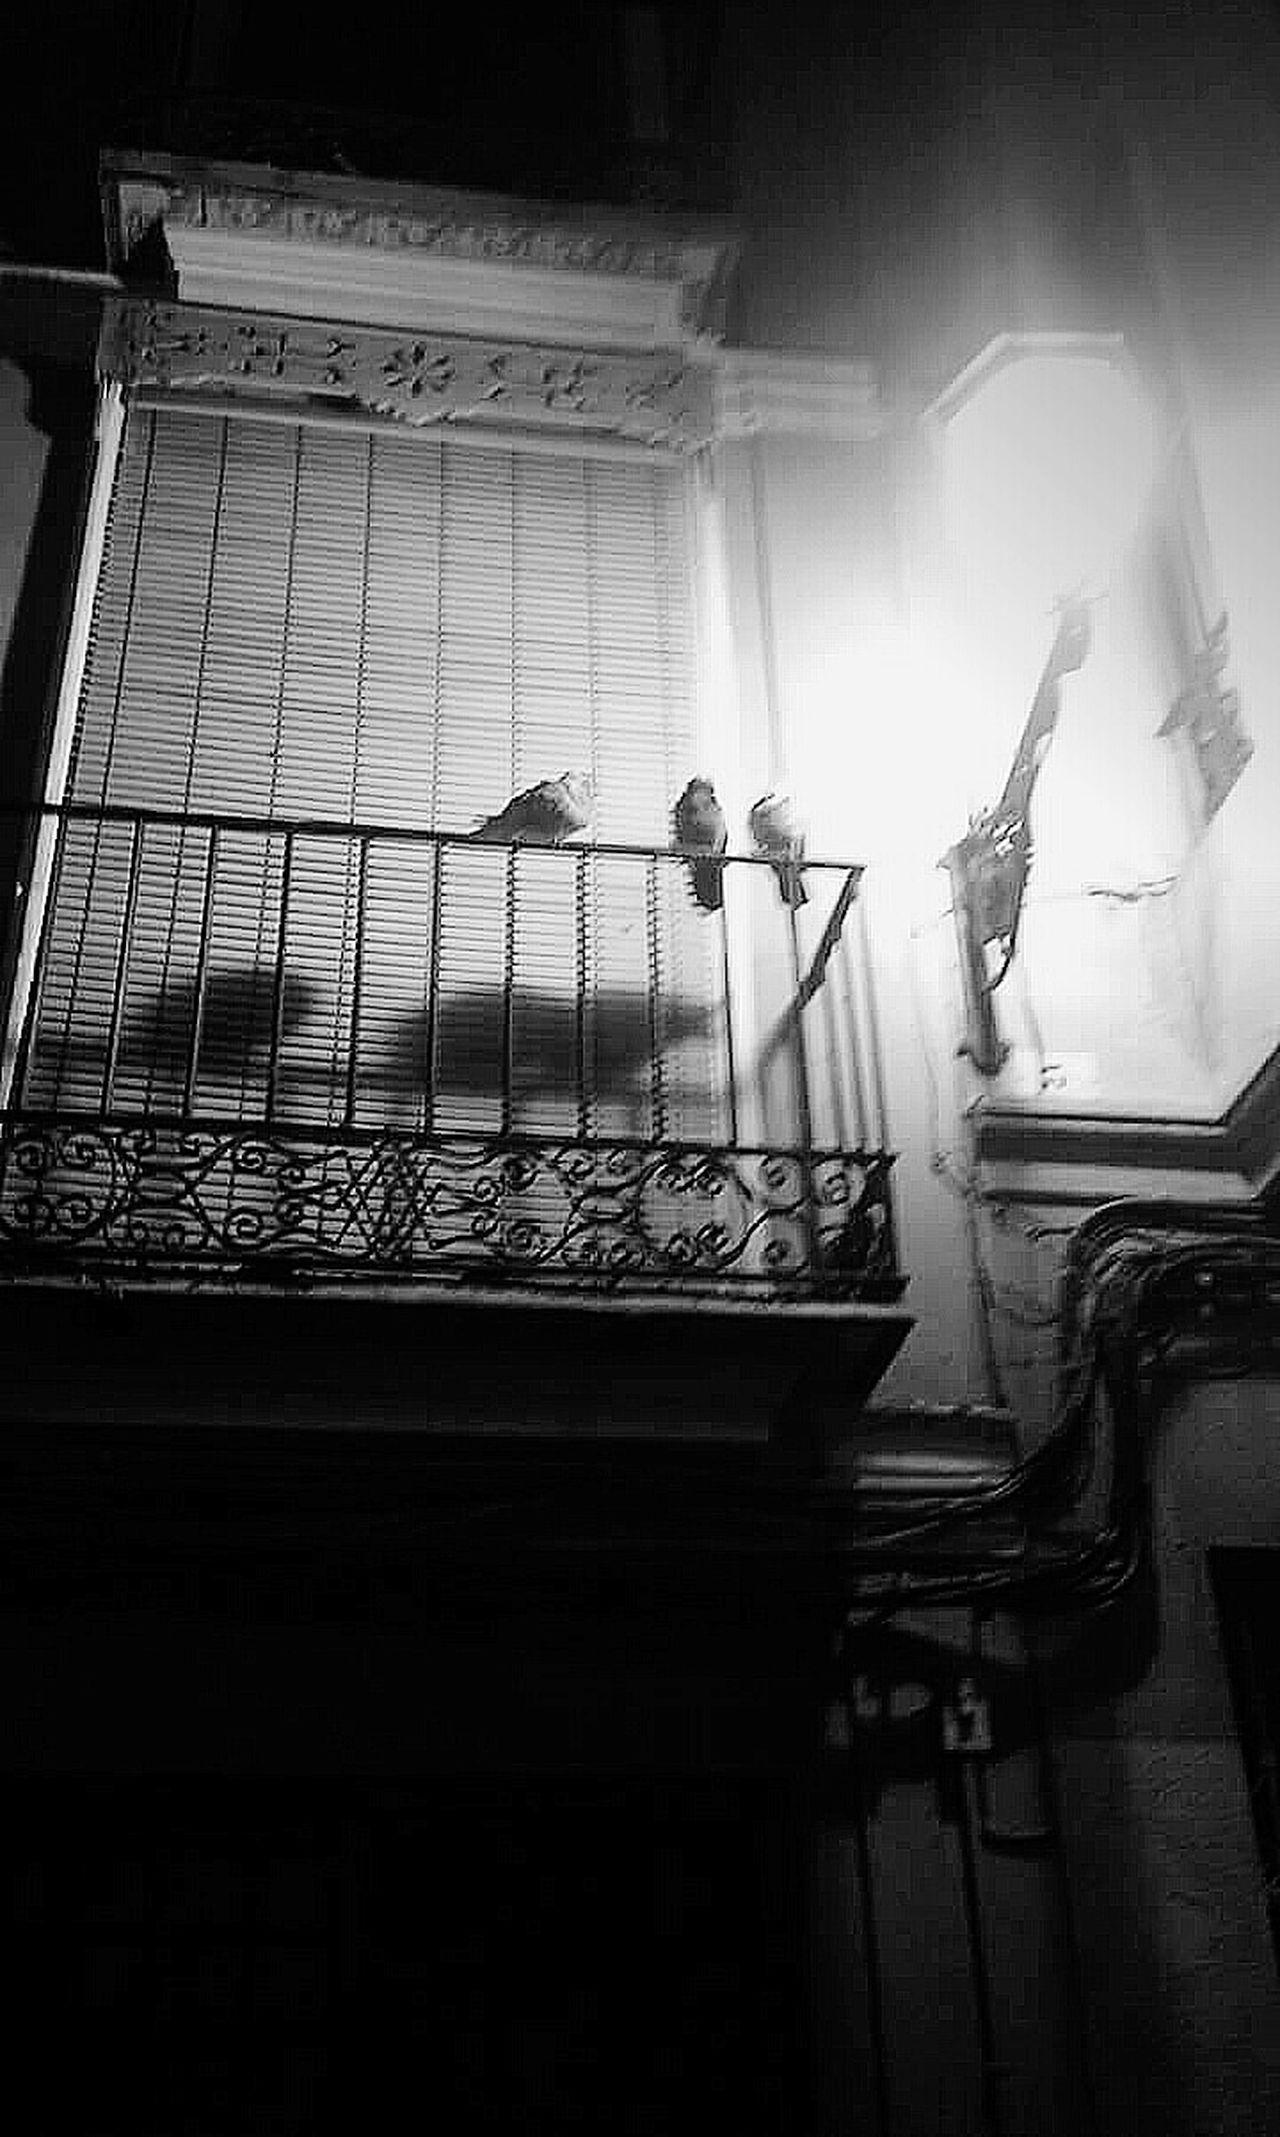 Taking Photos EyeEm Hi! Goodmorning He Visto La Luz Nightlights City Lights Pidgeons No People Darkness And Light Blancoynegro B&w Lamp Lighting Antique Light Springishere Reupload:)